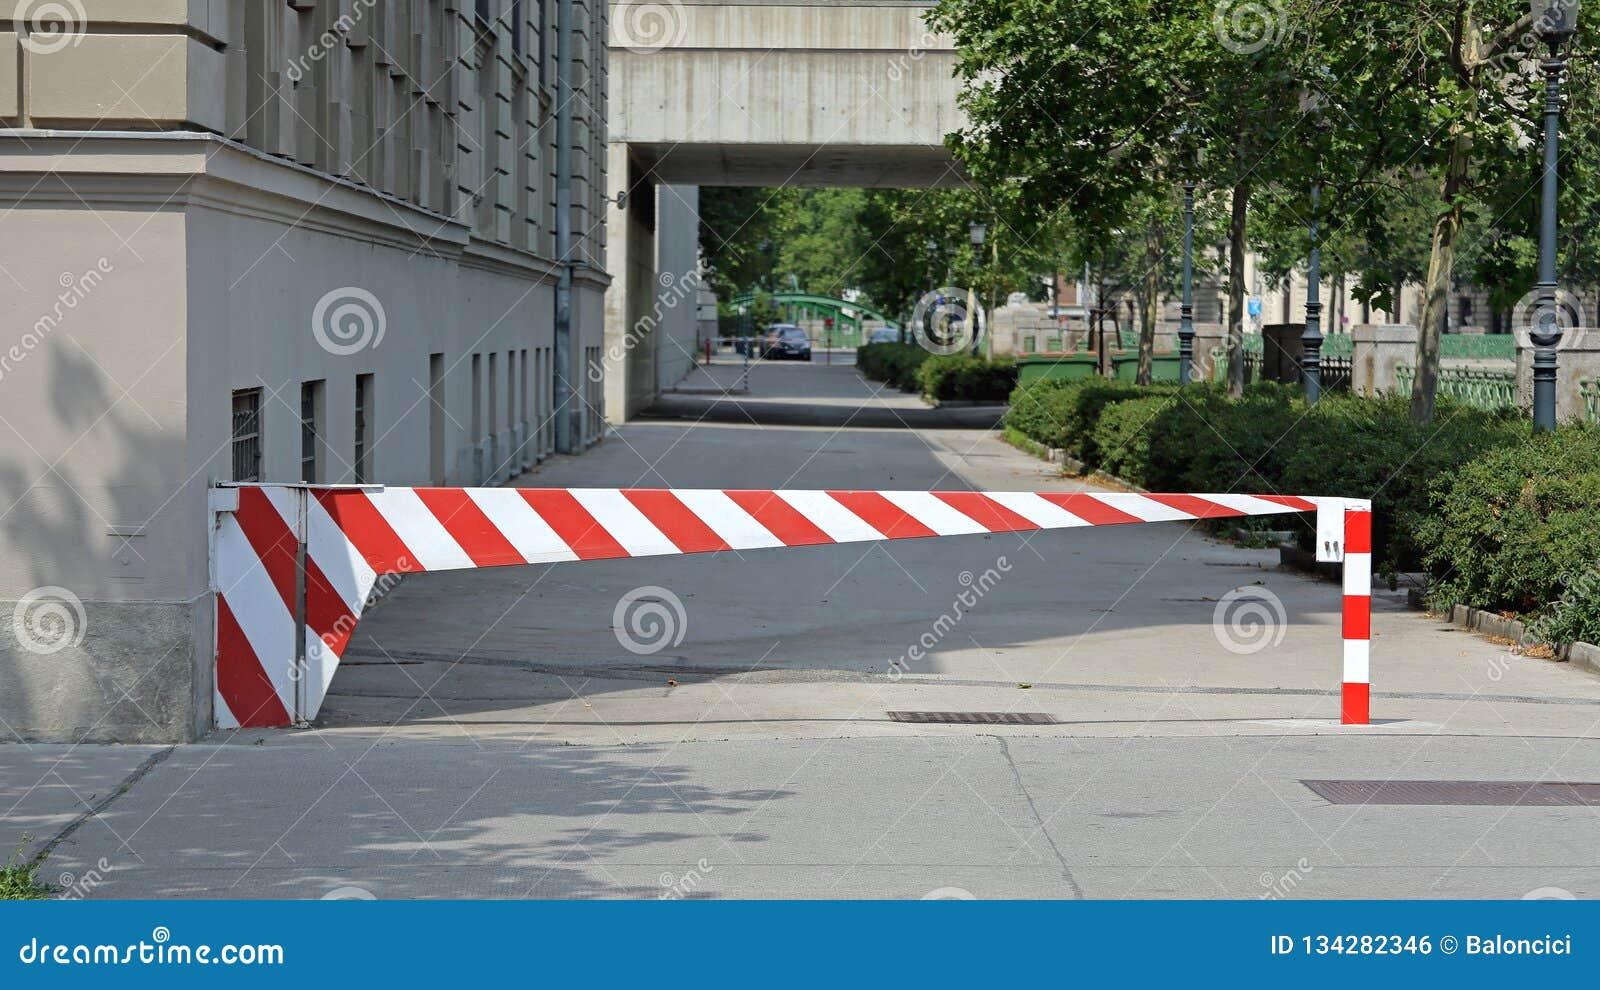 Parking Barrier stock photo  Image of street, diagonal